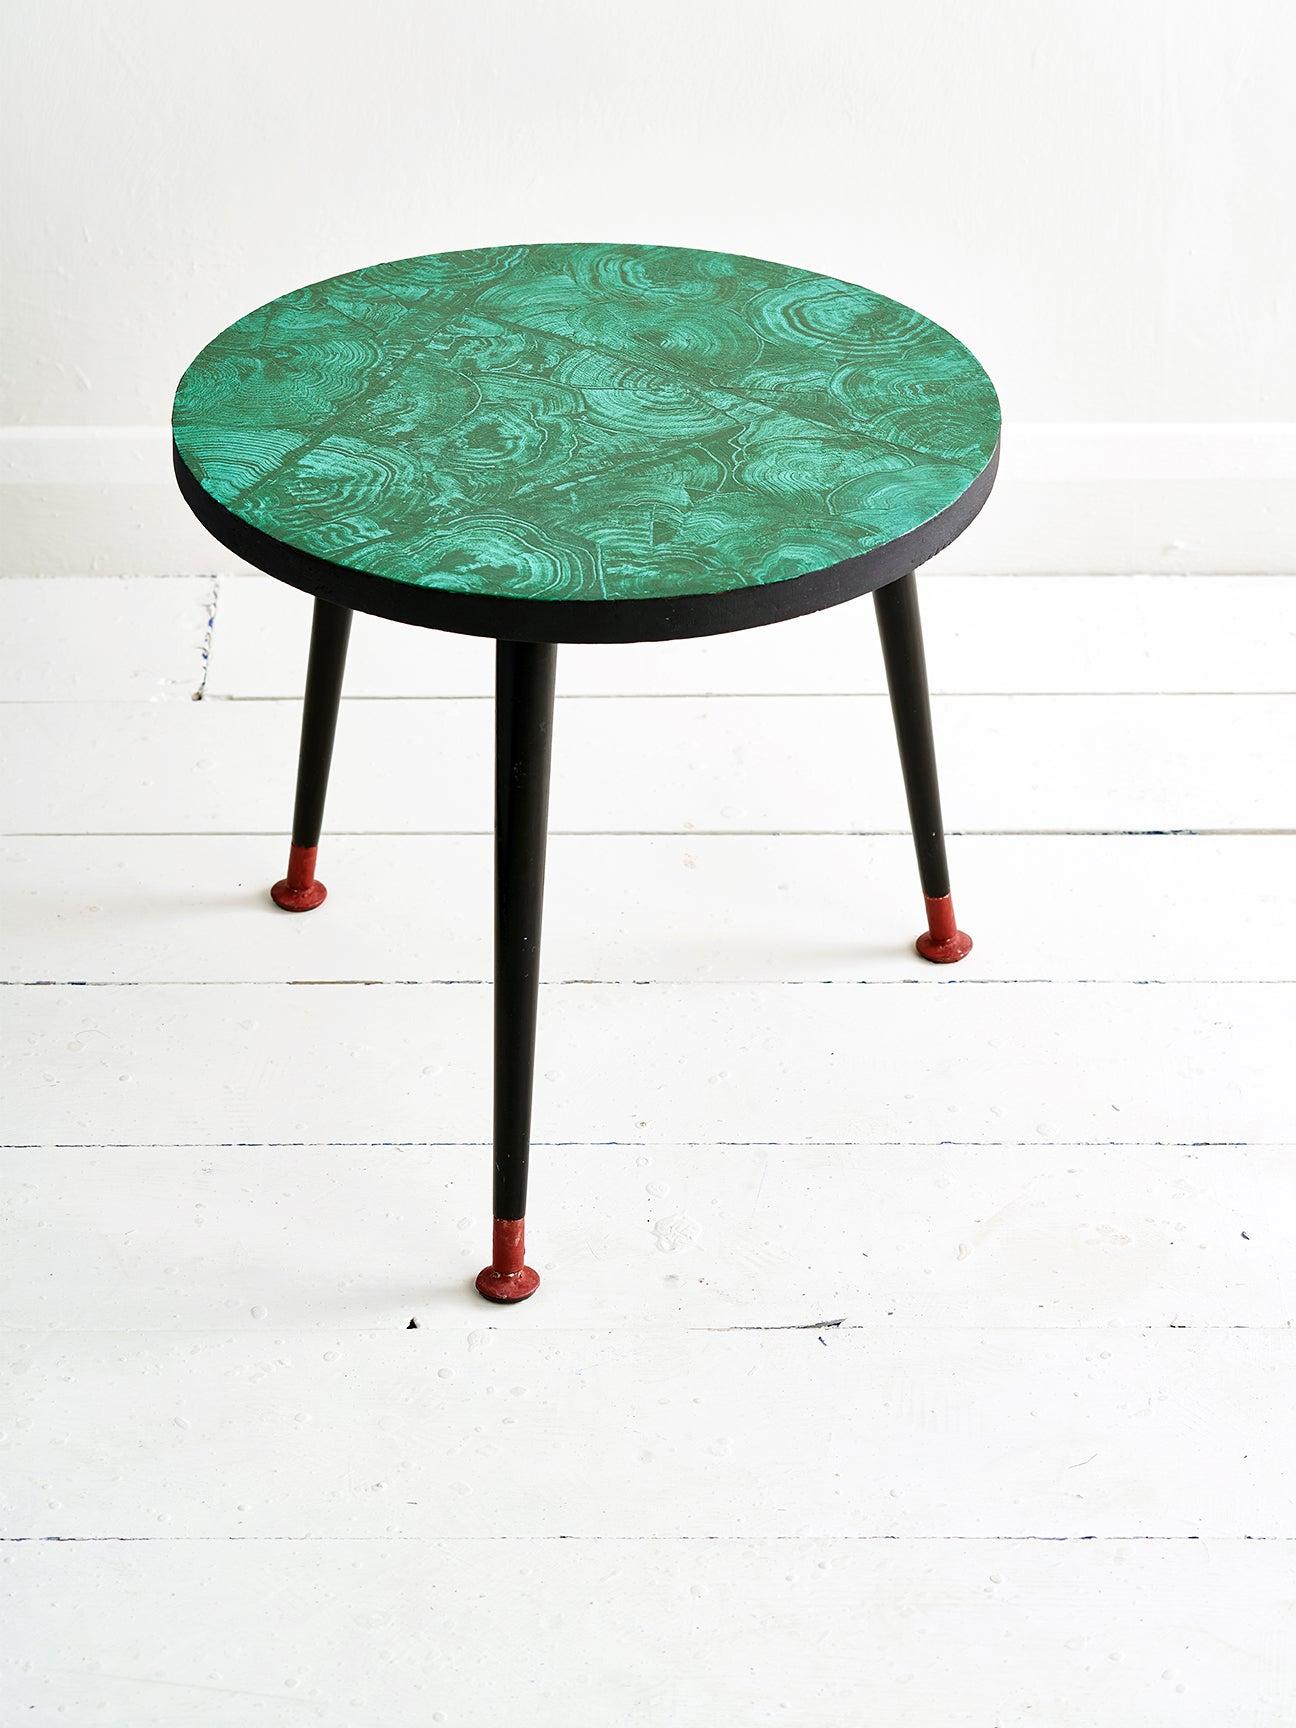 malachite green table top